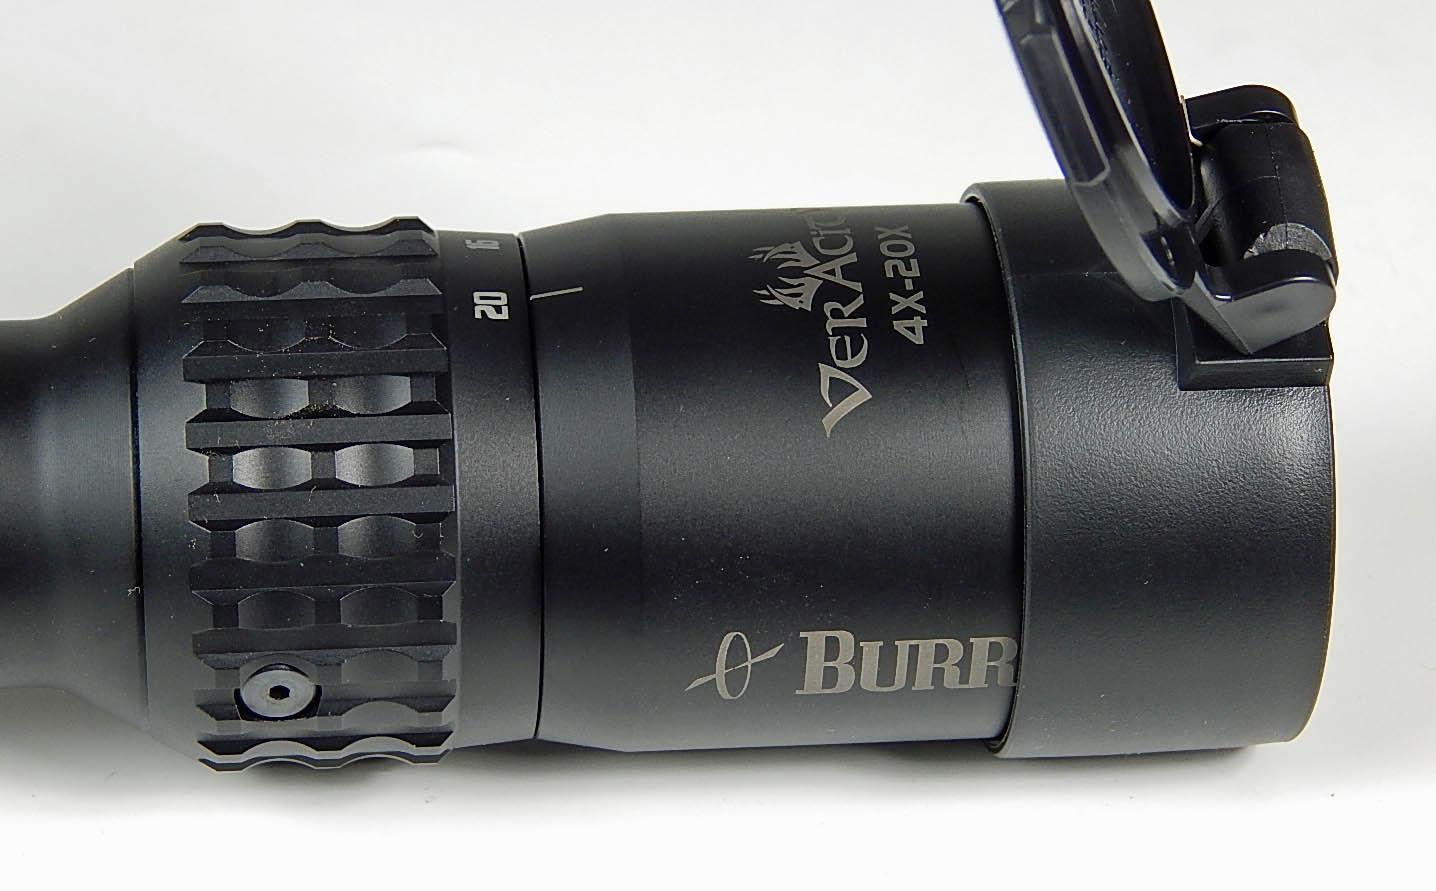 Burris Veracity Riflescope 4 20x50mm 30mm Ball E1 Ffp